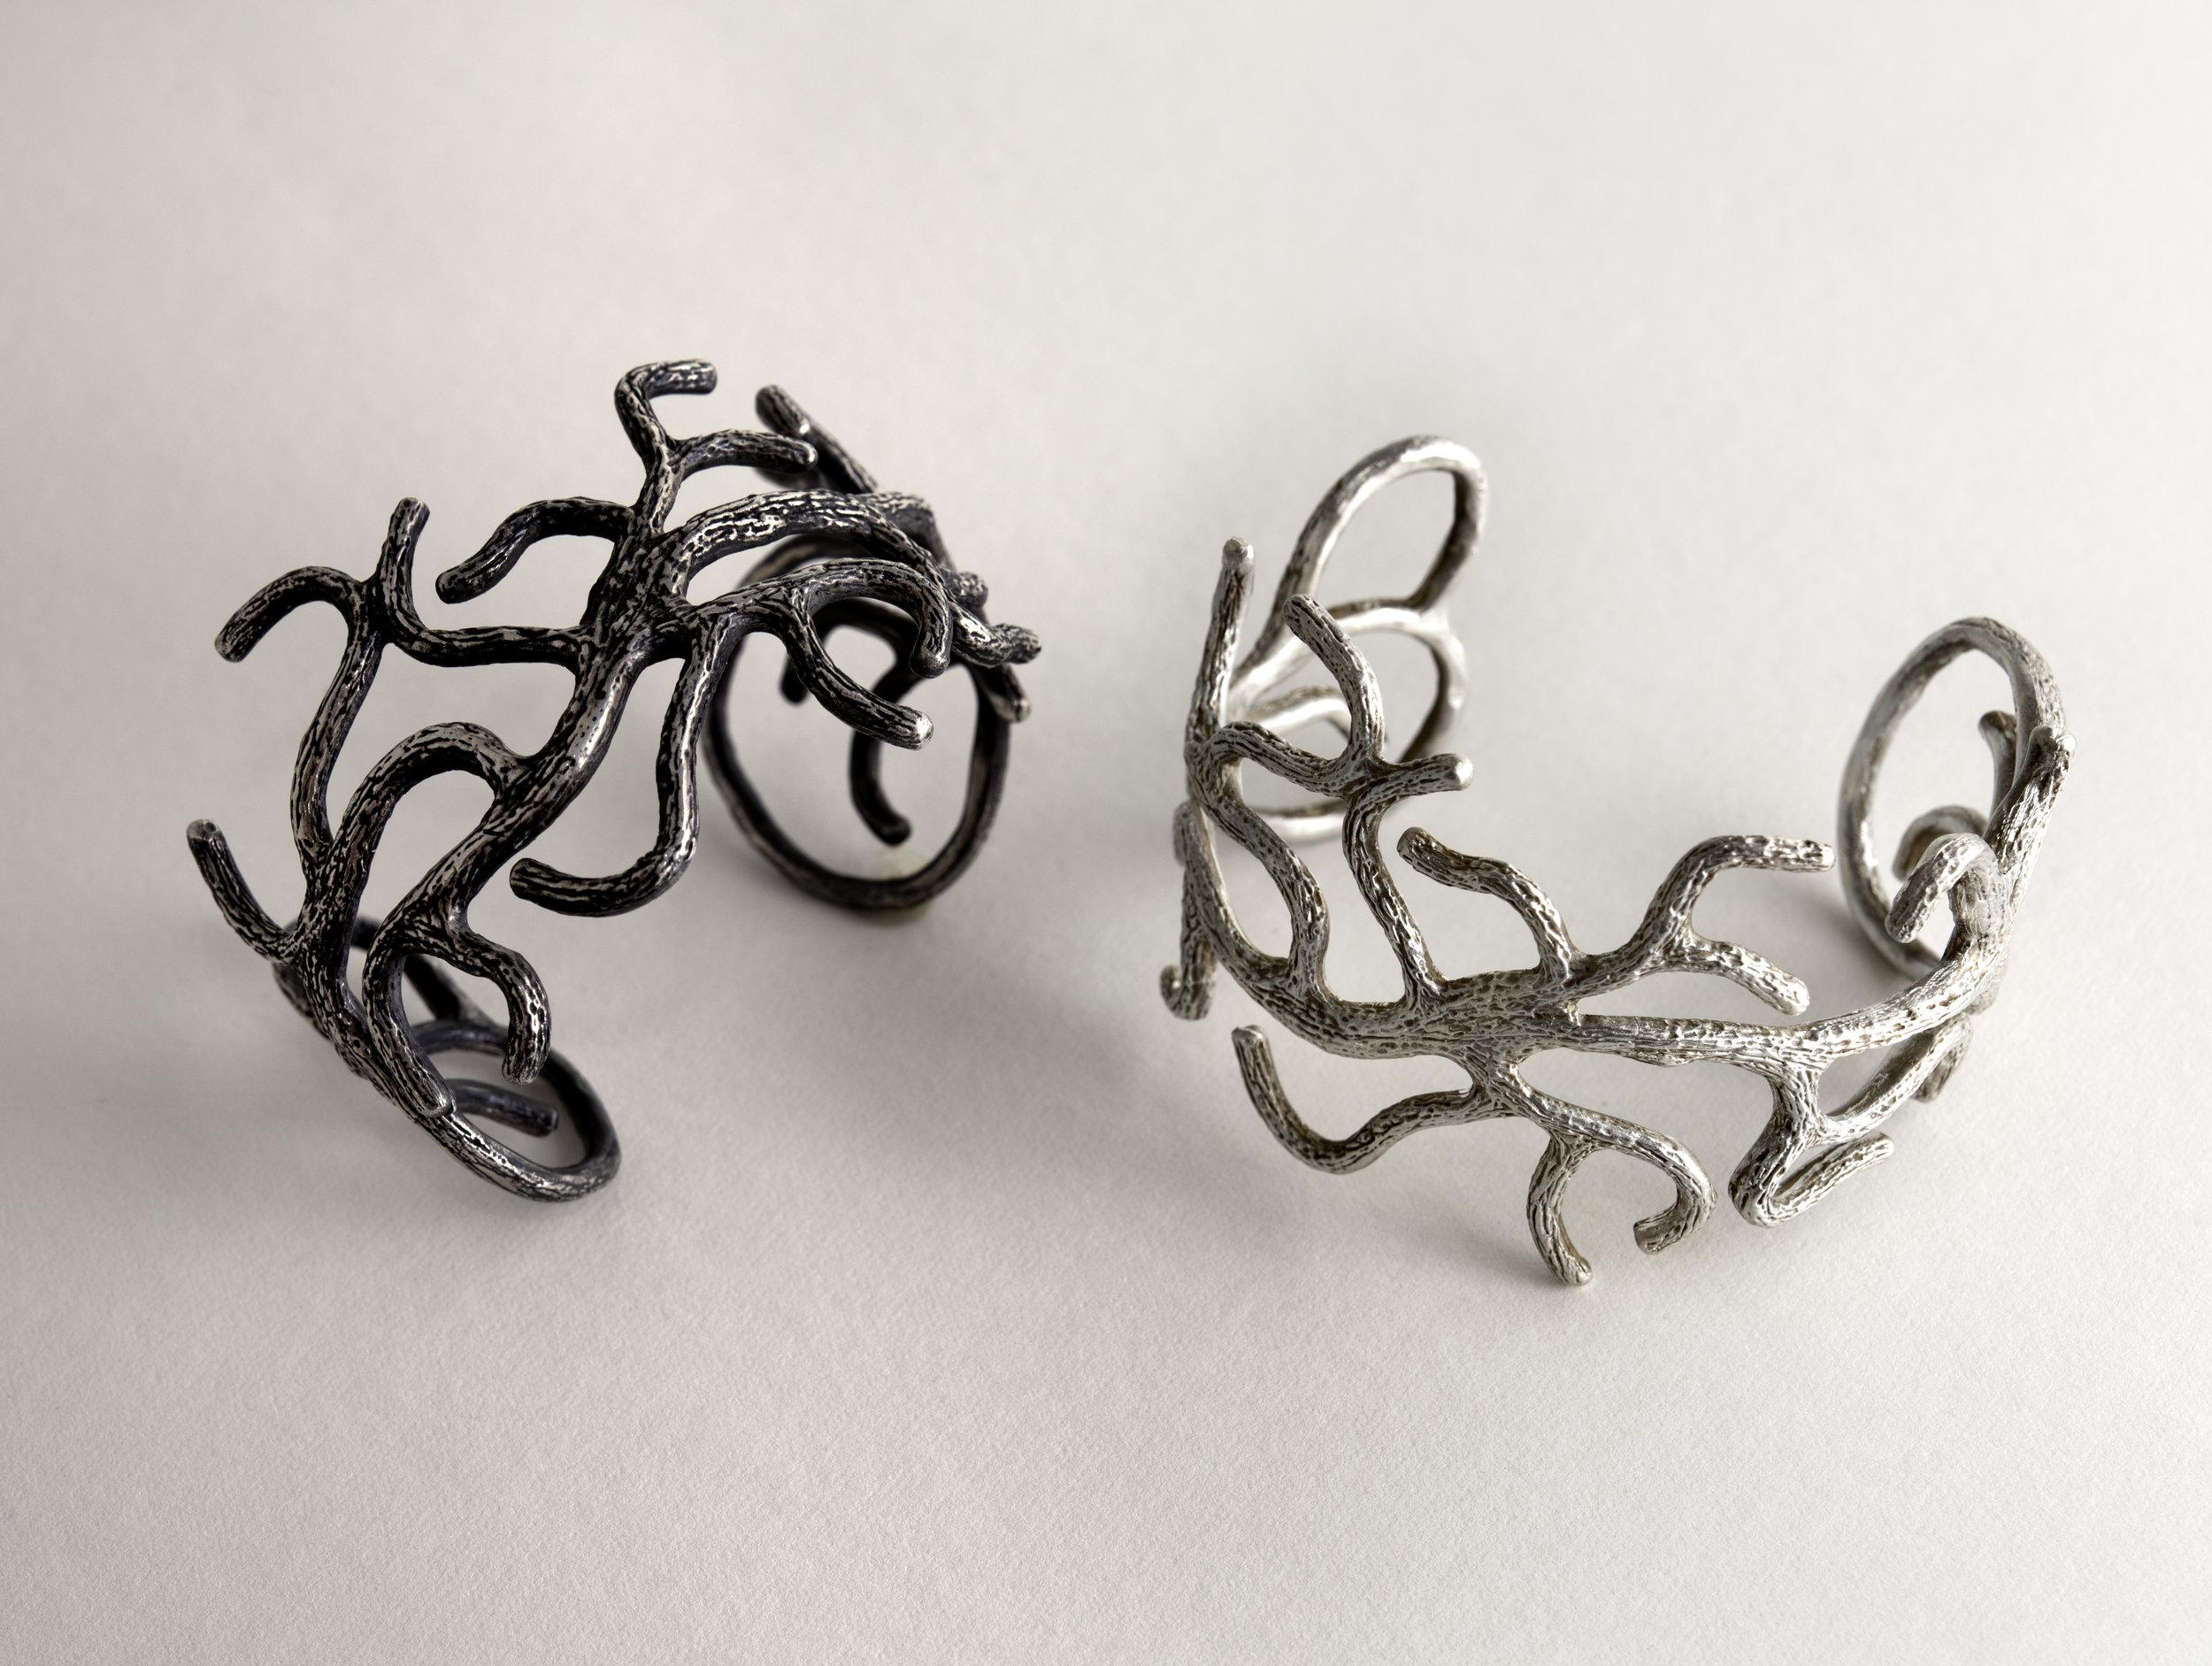 3.Sterling Silver Branch Bracelet.jpg